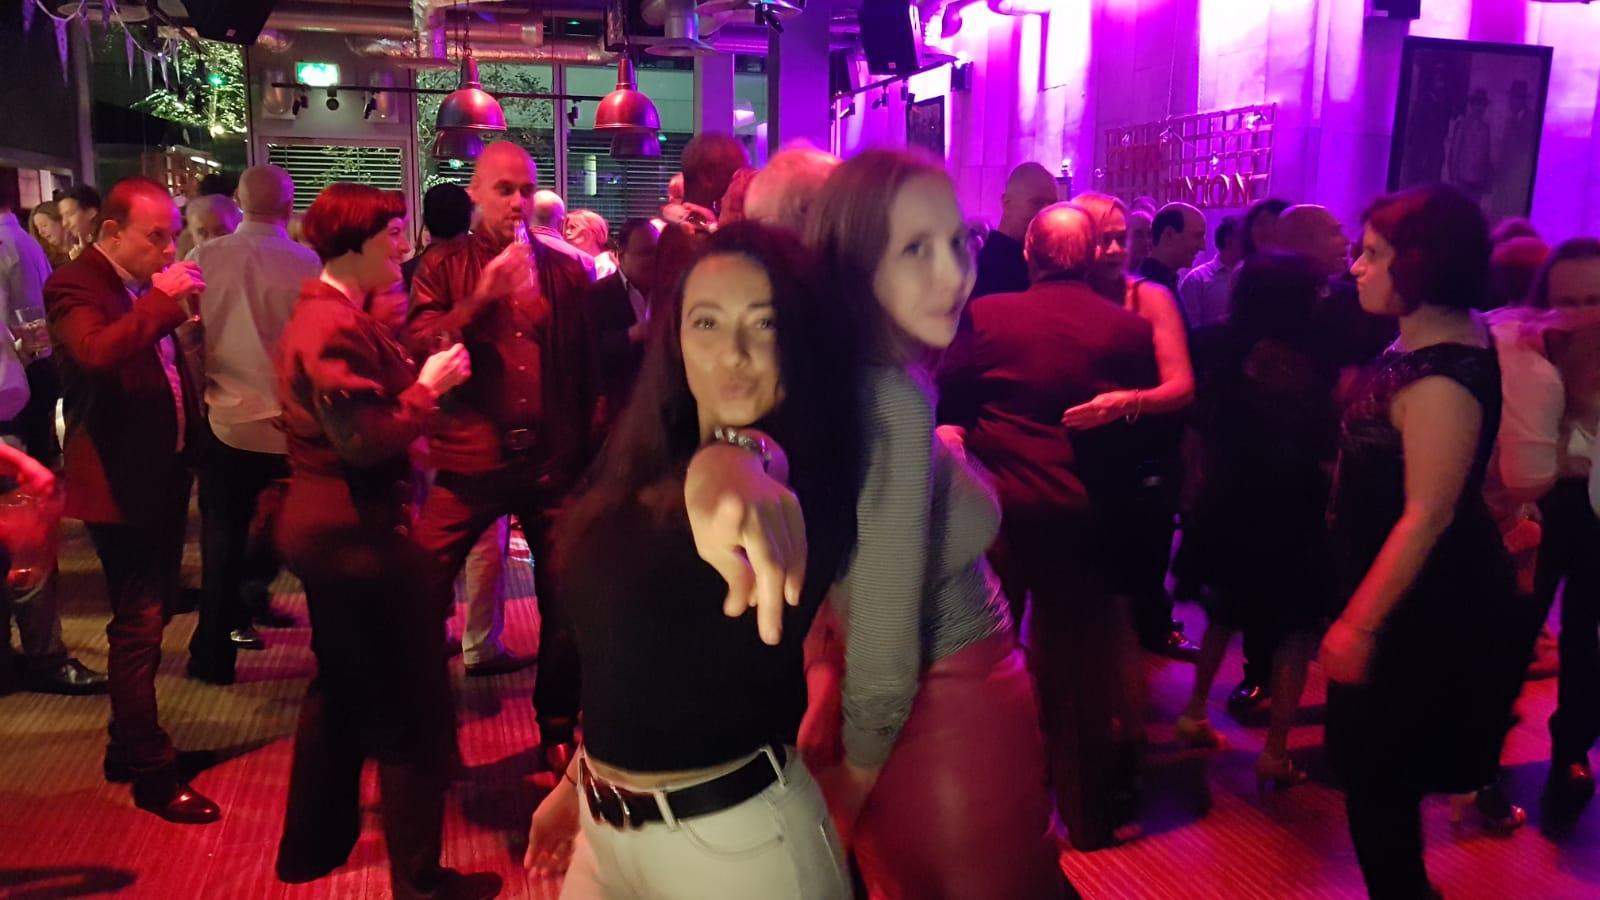 Singles dances in london ontario -